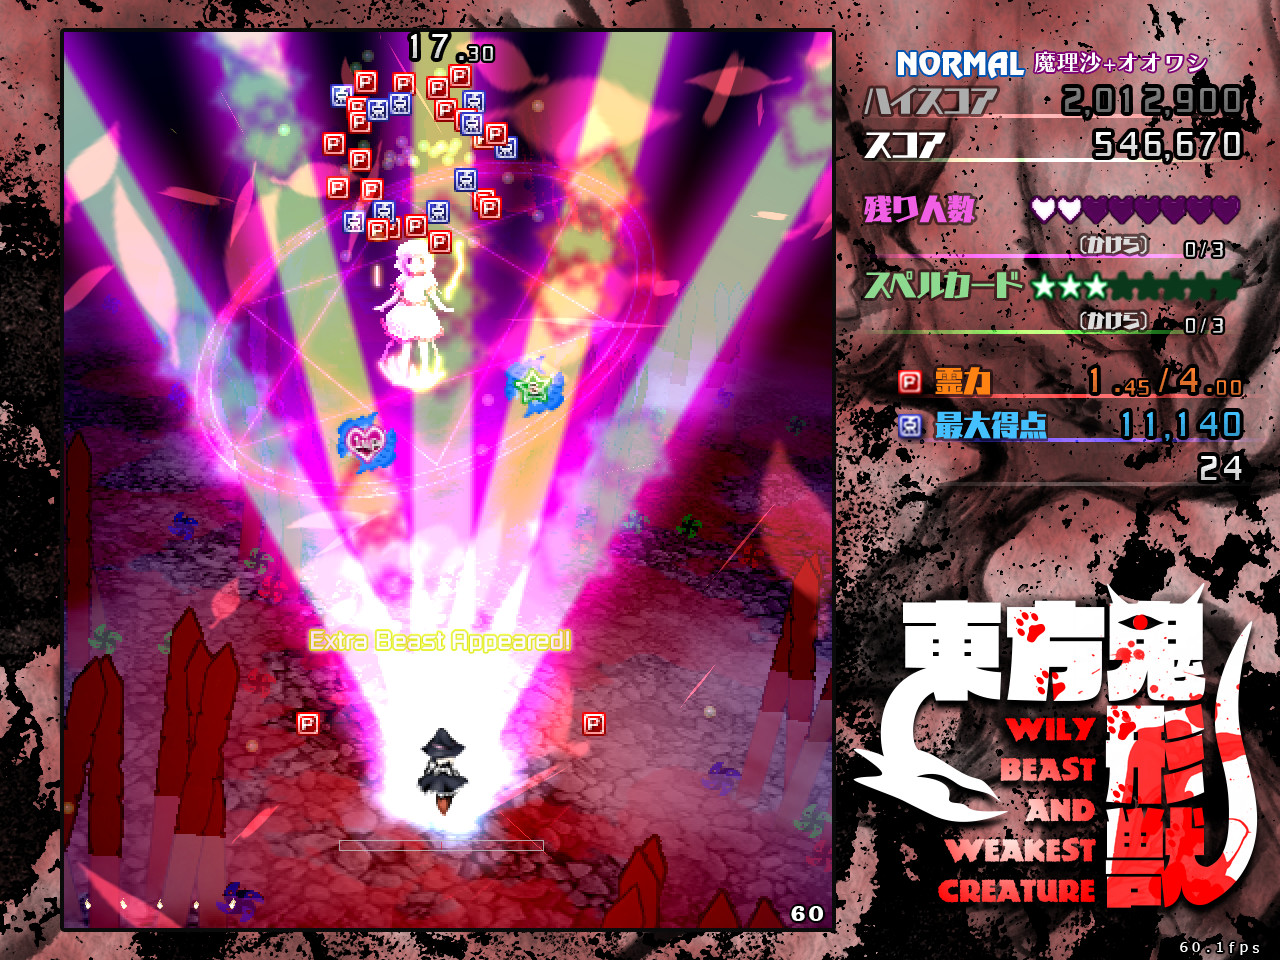 Touhou Kikeijuu Wily Beast and Weakest Creature Free Download